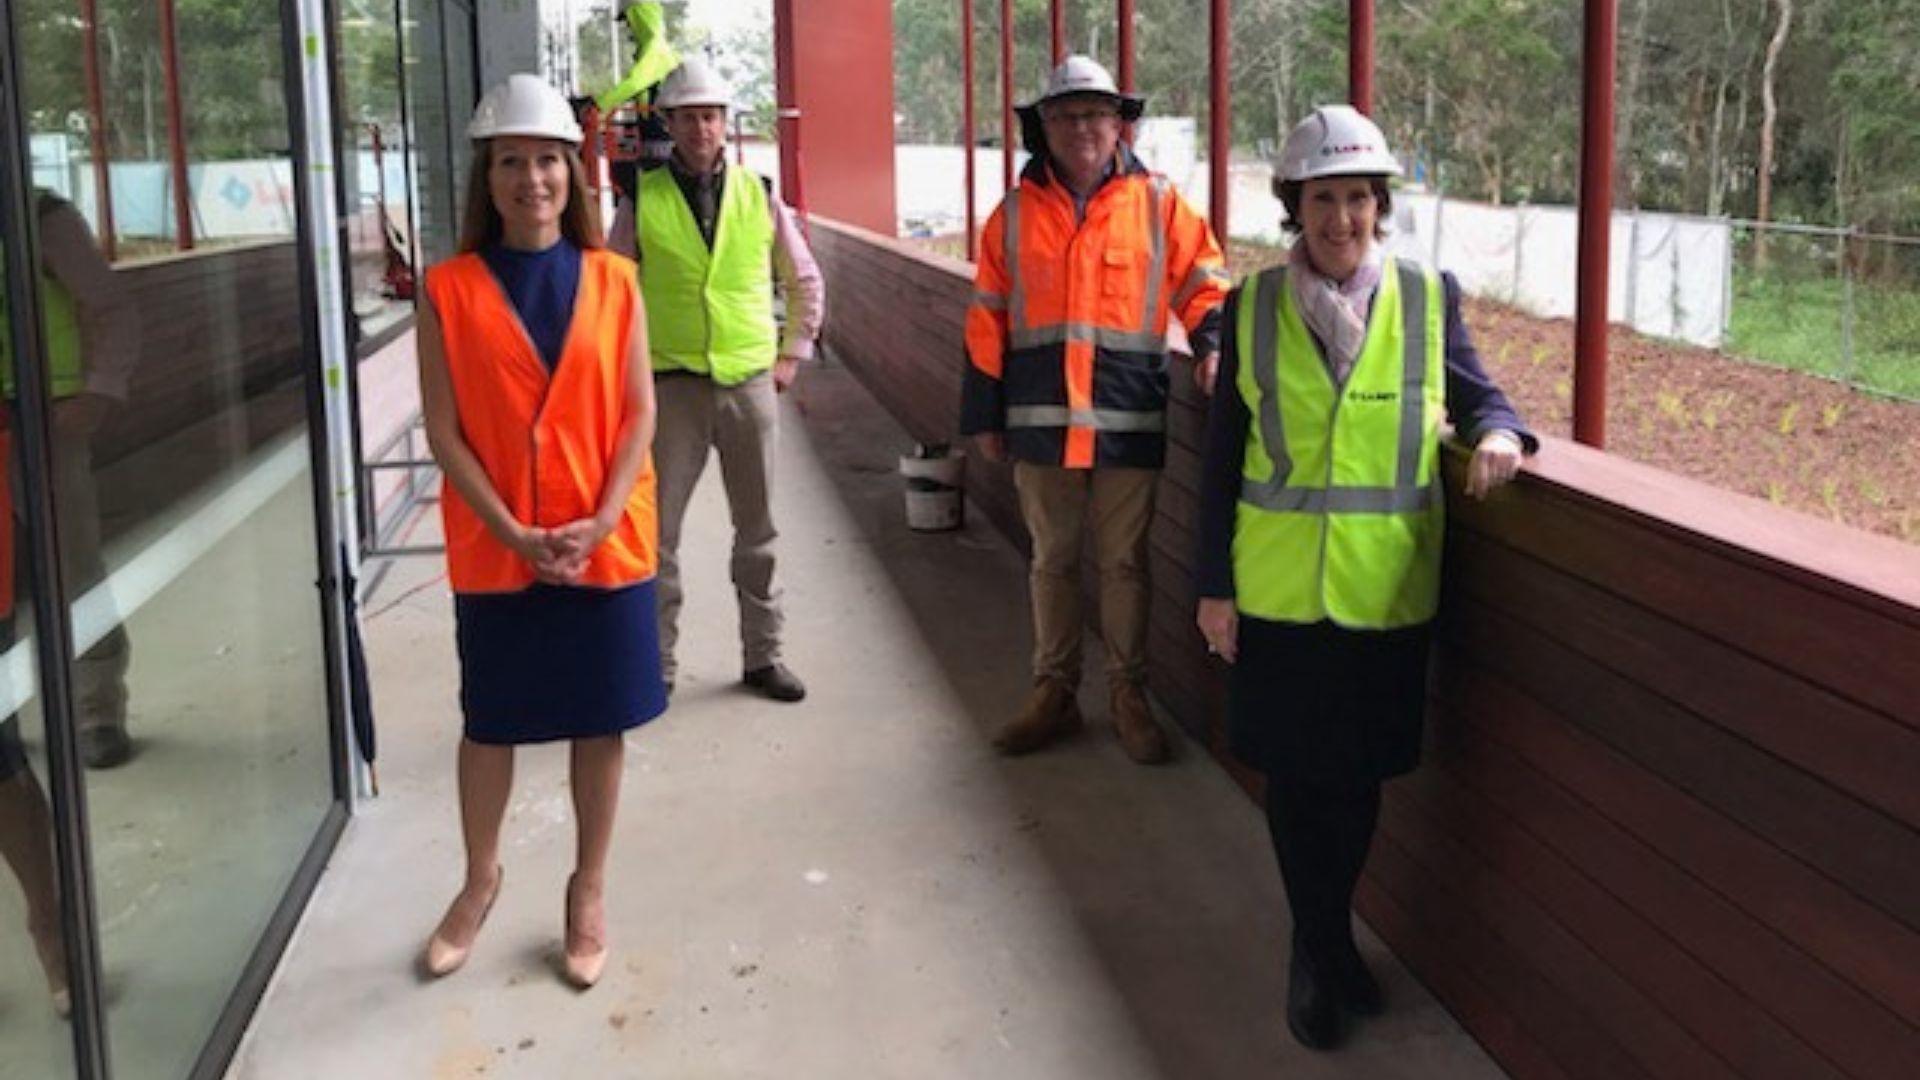 Progress on Stage 2 Development at Charles Sturt in Port Macquarie revealed